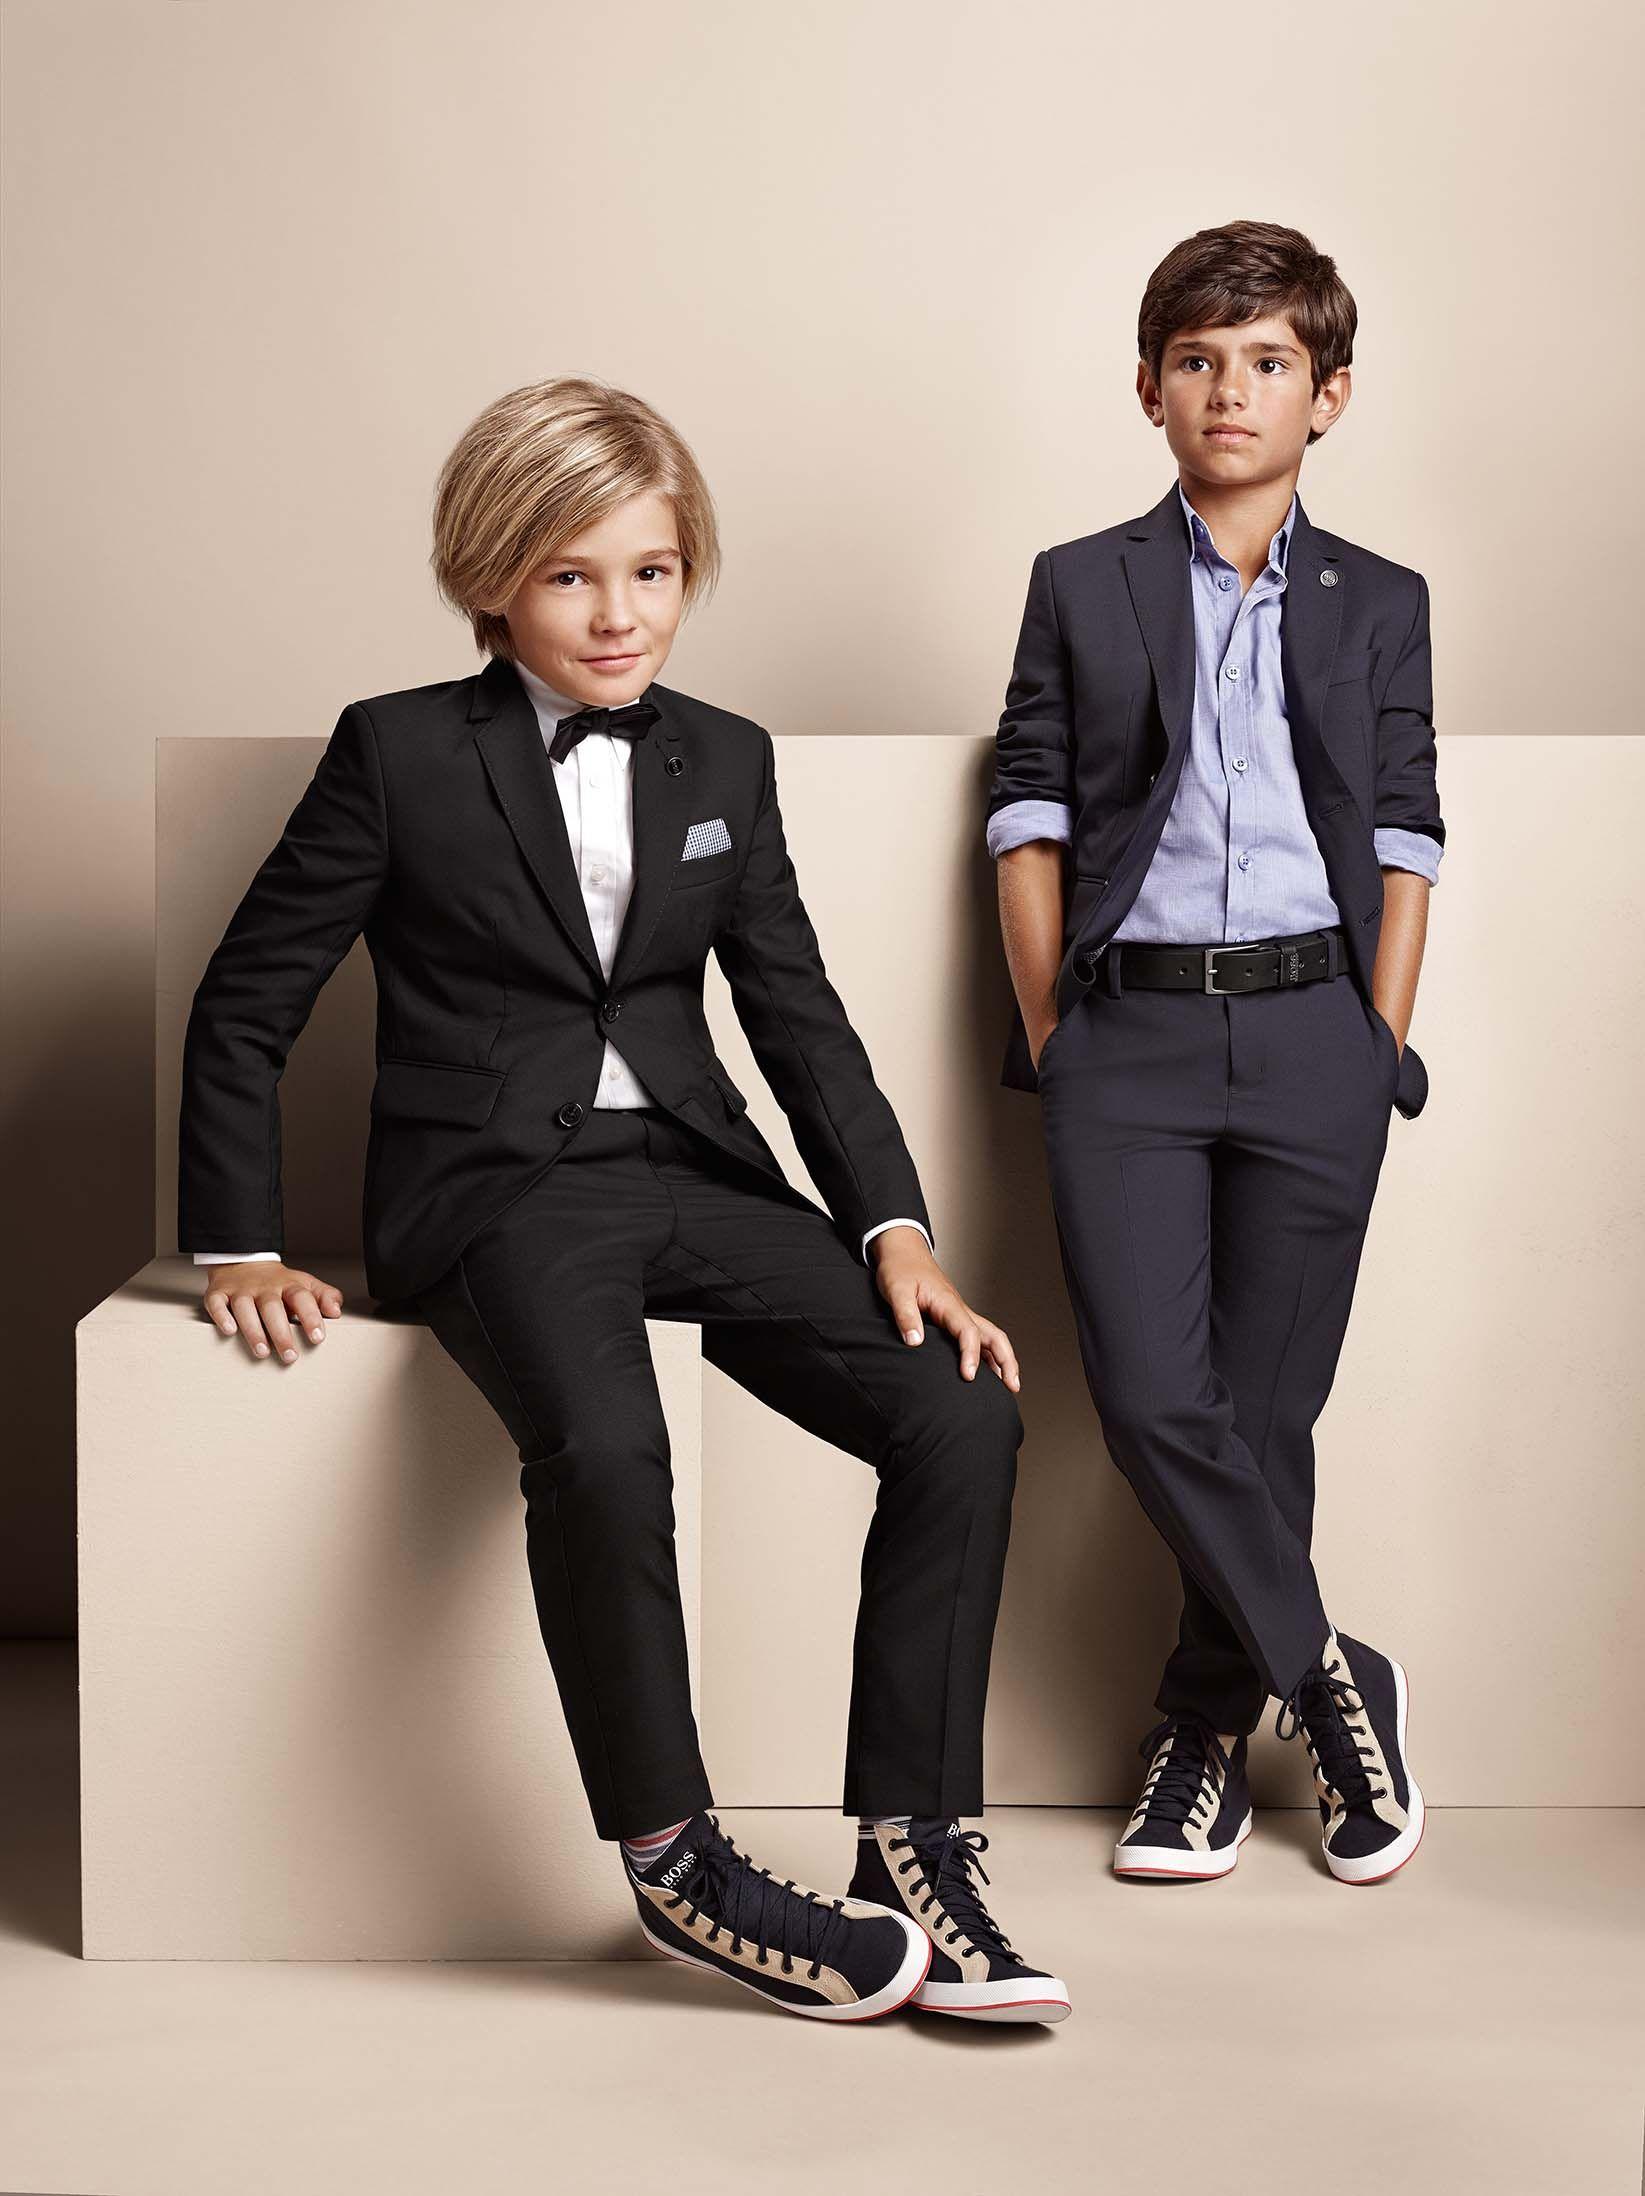 elegant suits boss - fashion for boys - mode enfant garcon